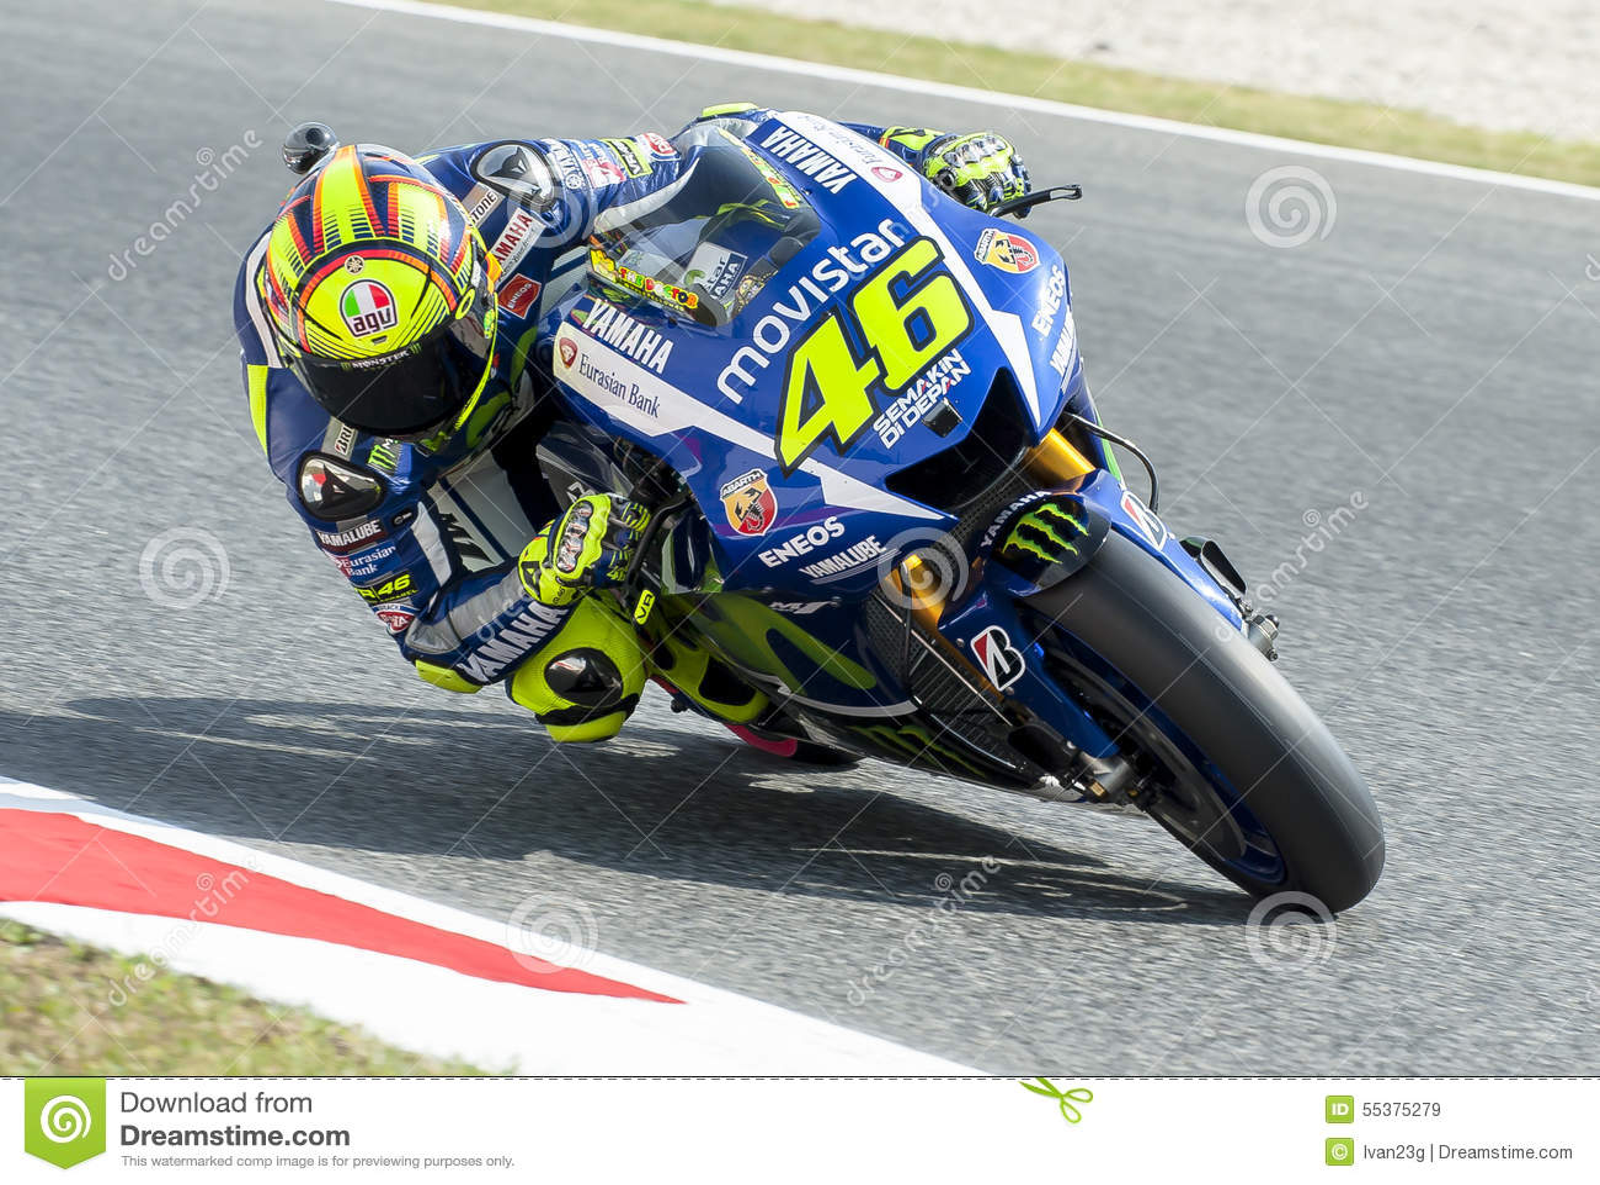 GP CATALUNYA MOTO GP 2015 - VALENTINO ROSSI